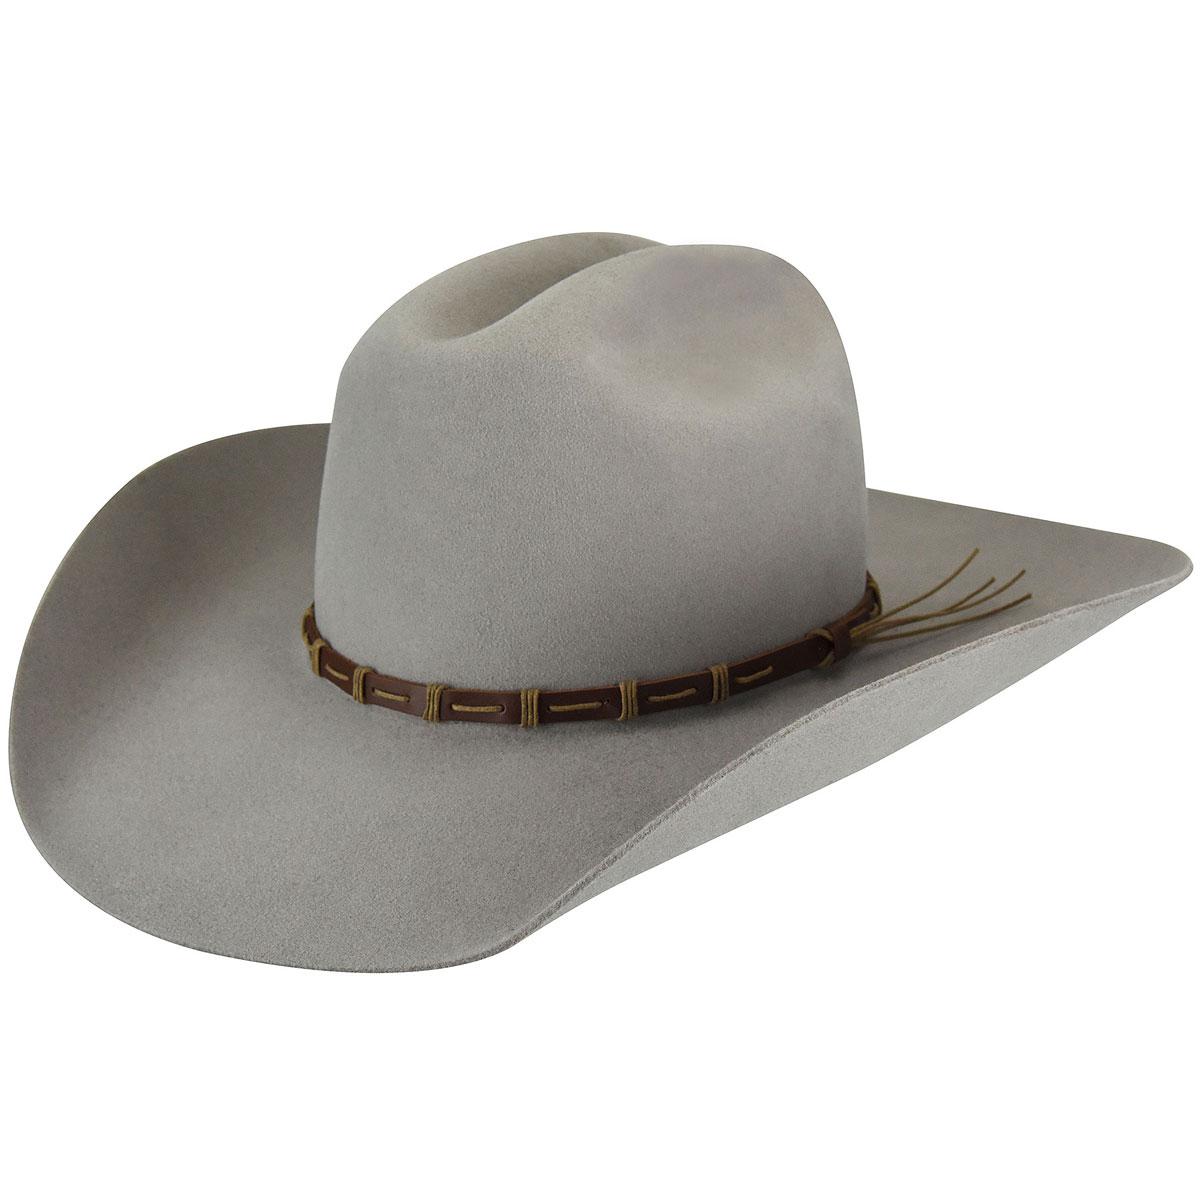 Bailey Western Alsworth 3X Western Hat in Silver Sand